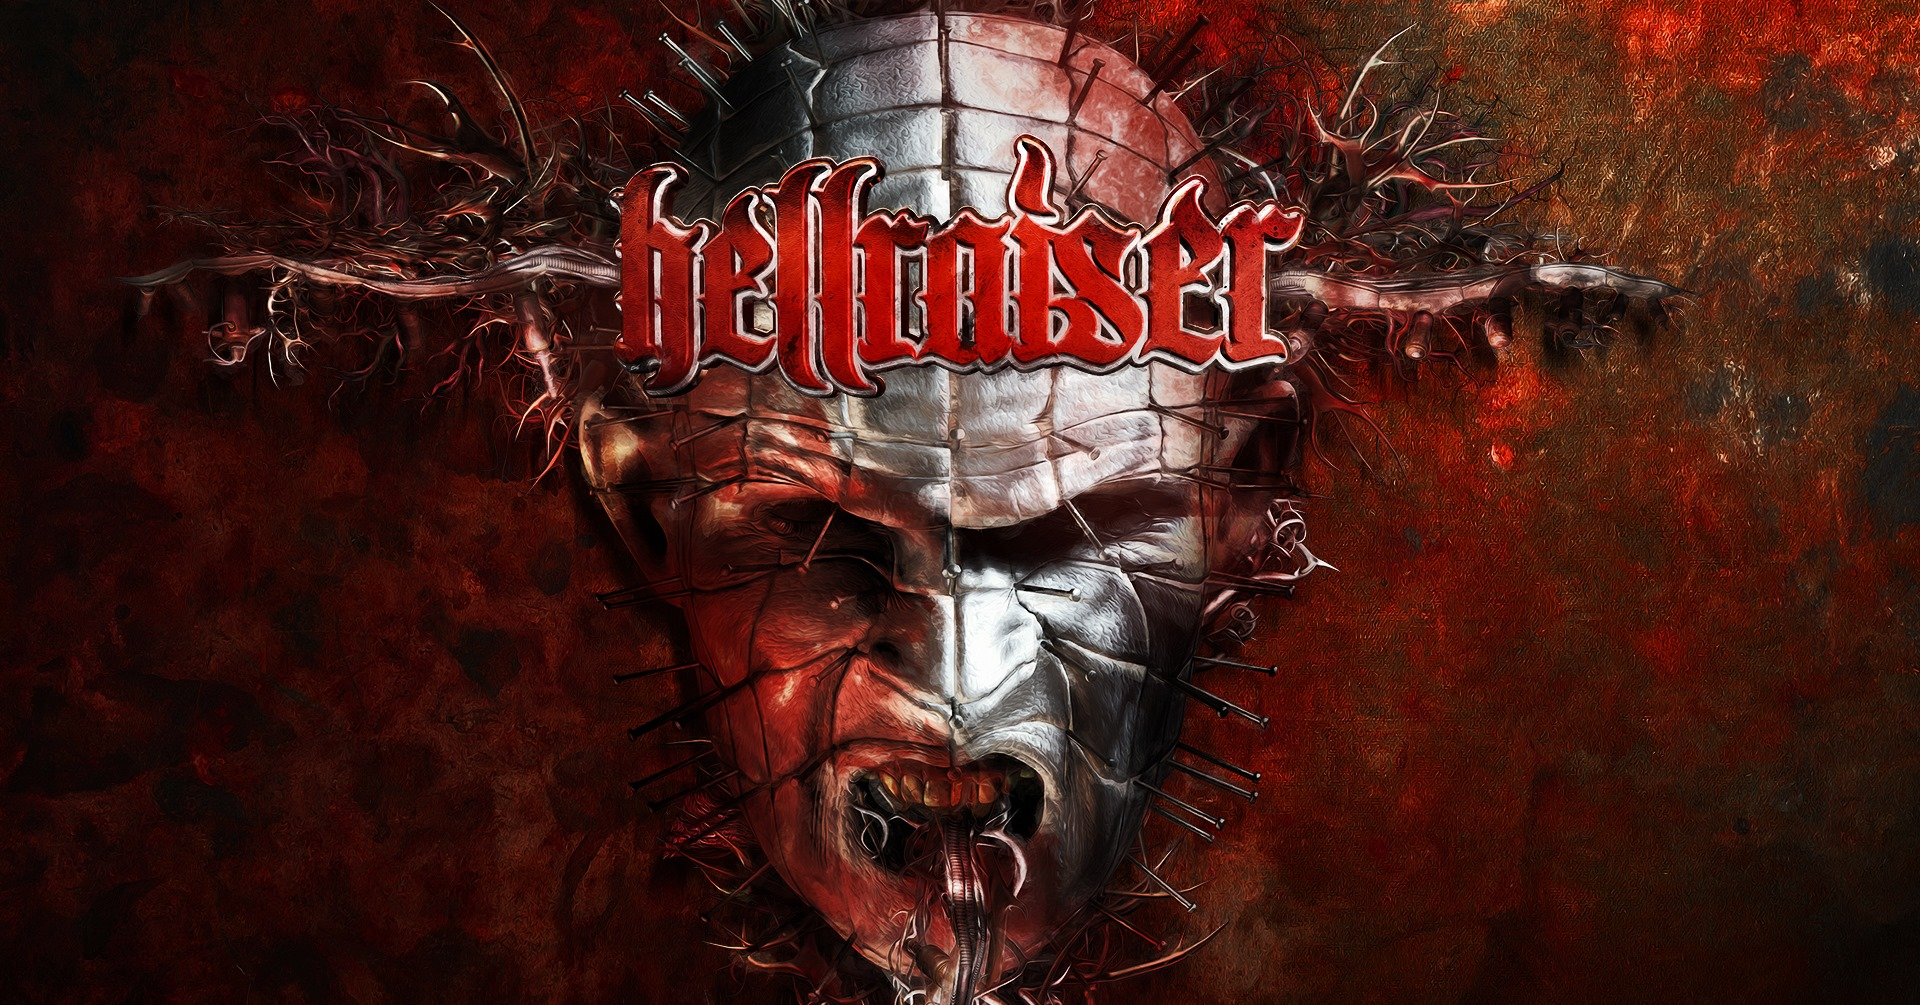 Hellraiser a waste of good suffering